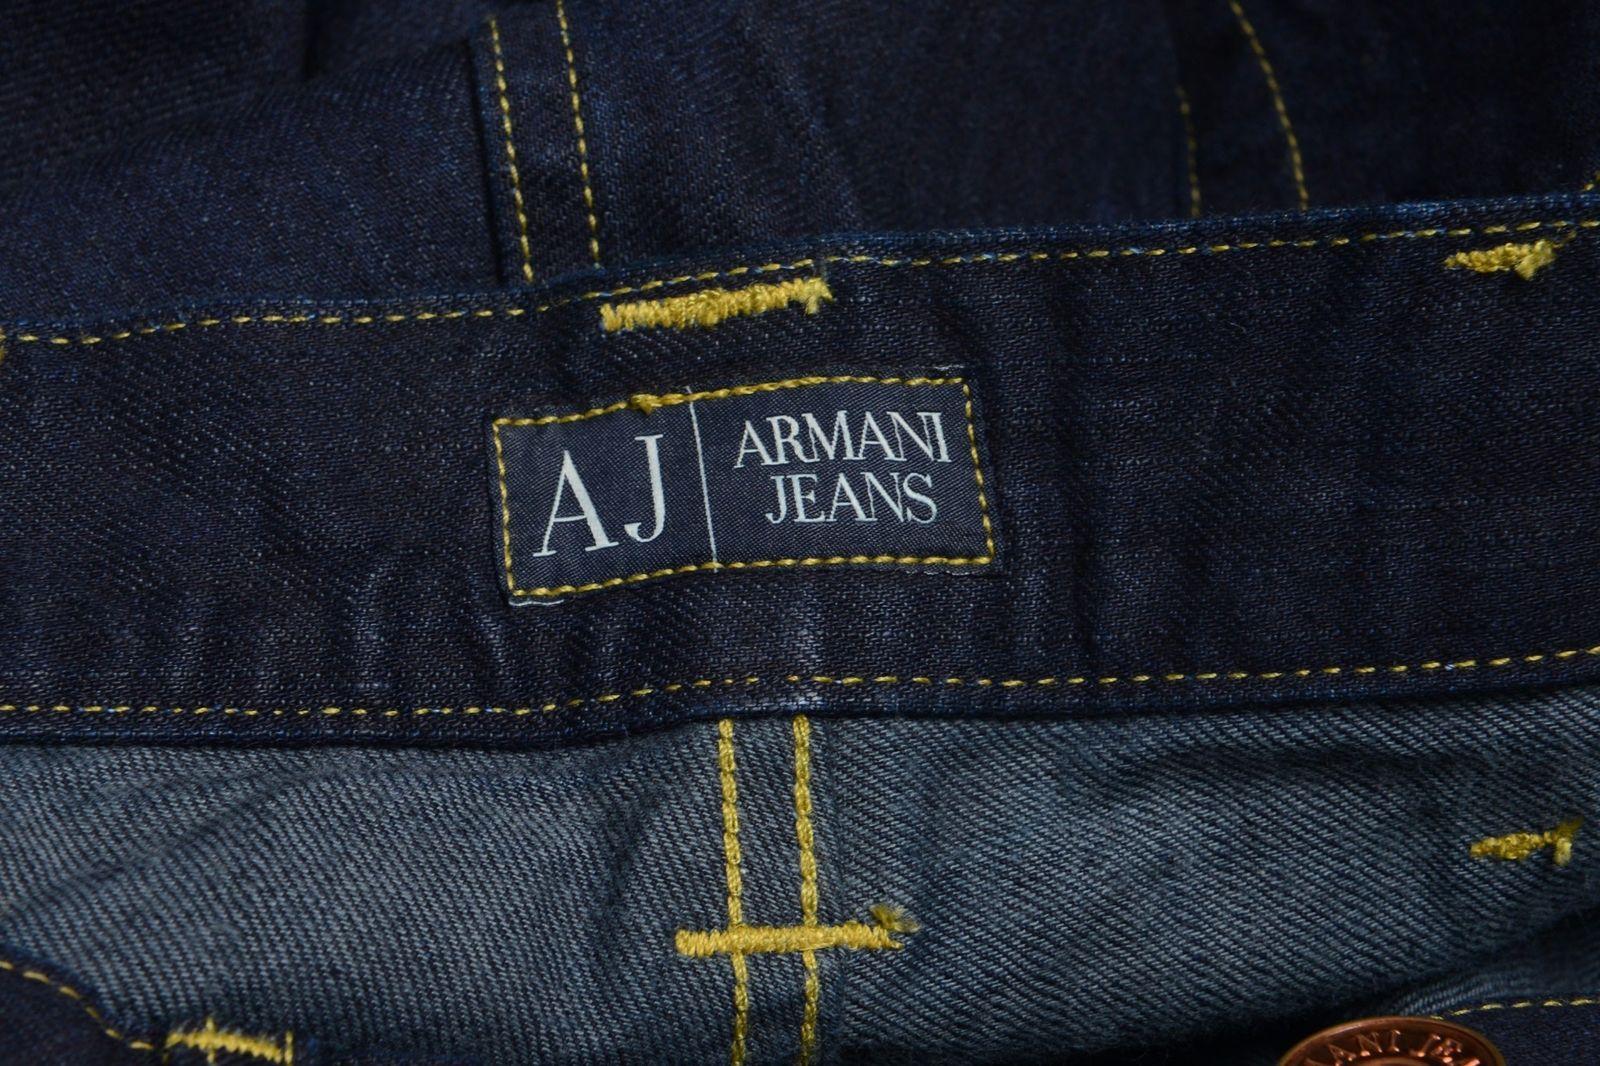 bab696e8 Armani Jeans AJ Men's Regular Fit Dark Blue Straight Leg Jeans